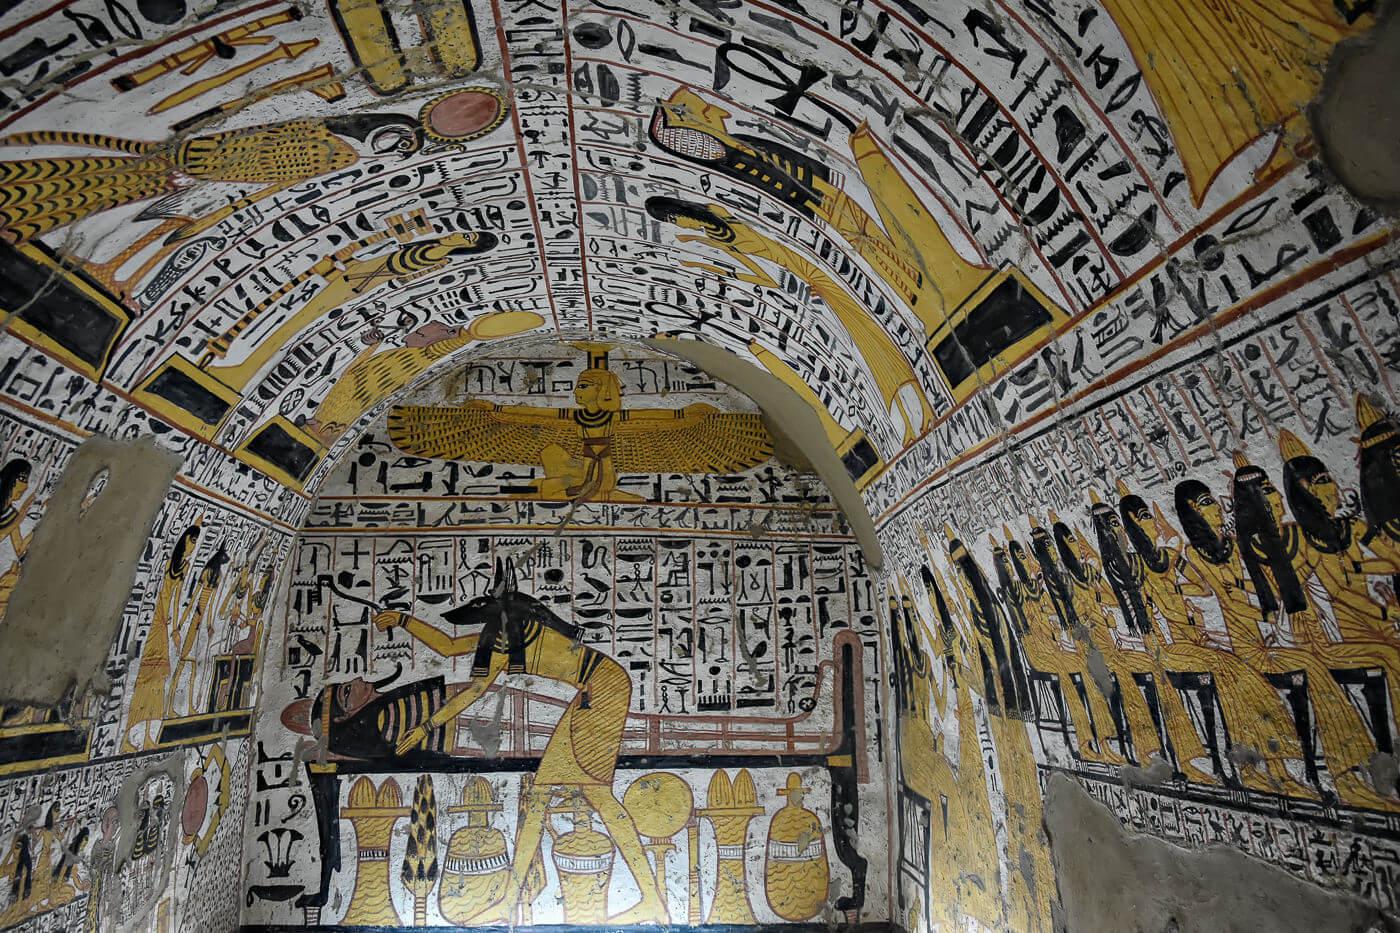 Tomb at Deir el Medina, Luxor, Egypt - Photo by Zed Sindelar of CuriousZed Photography